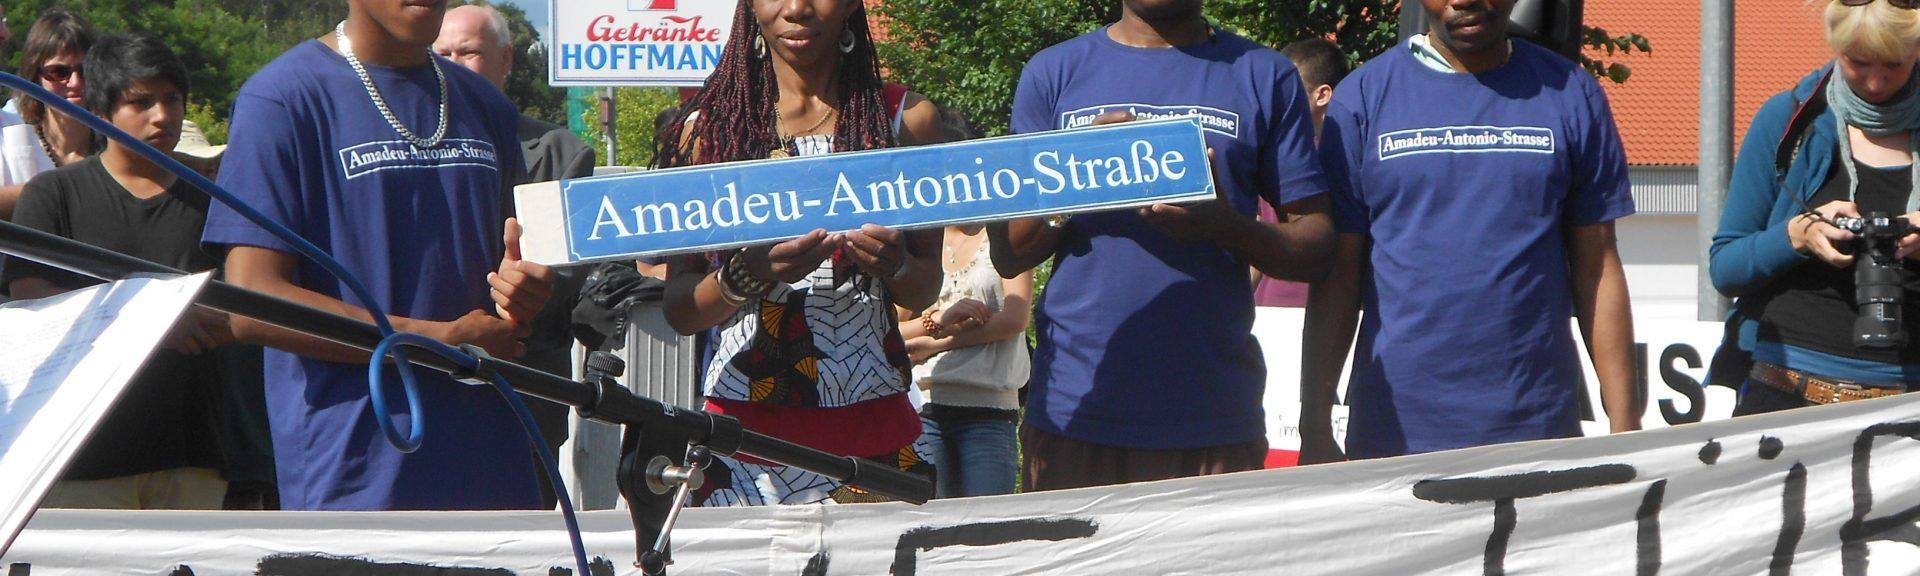 Amadeu_Antonio_Straßenumbenennung_16_9